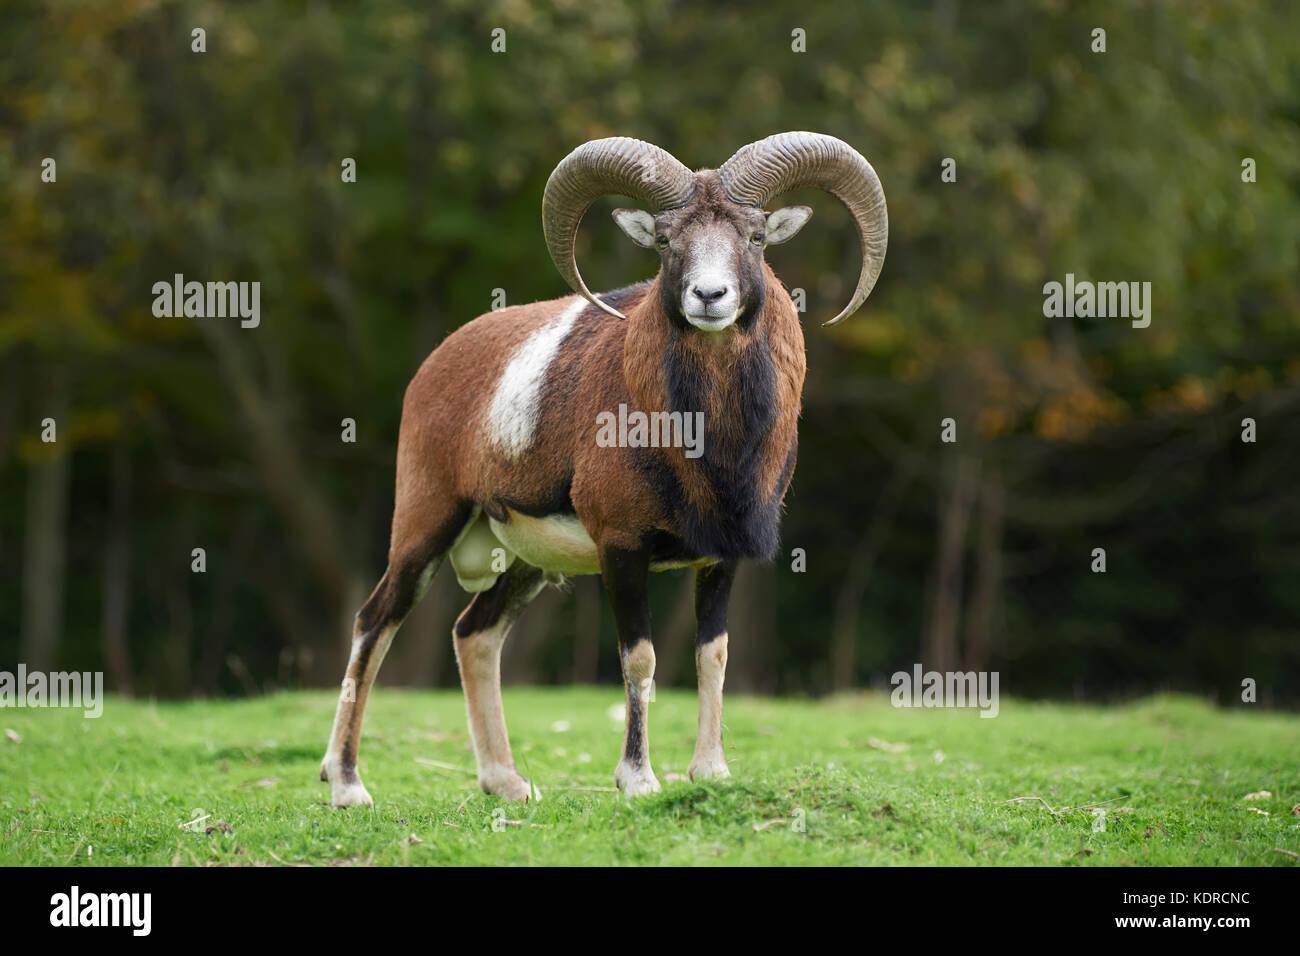 Große europäische Mufflon in der Natur Lebensraum Stockbild